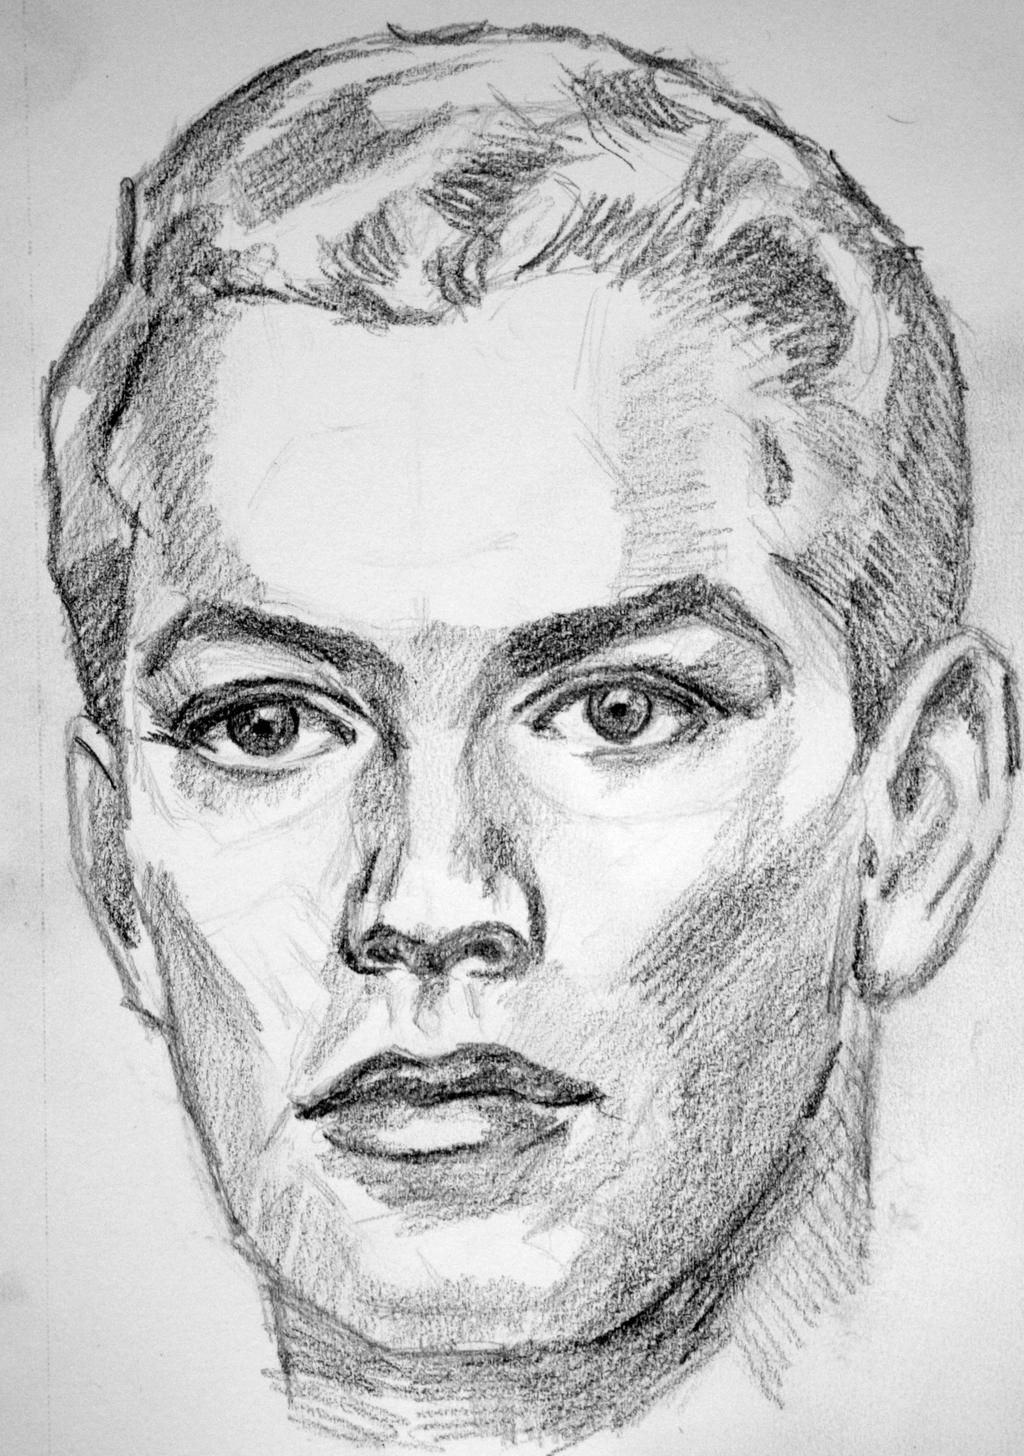 Sketch - Male Face by PMucks on DeviantArt